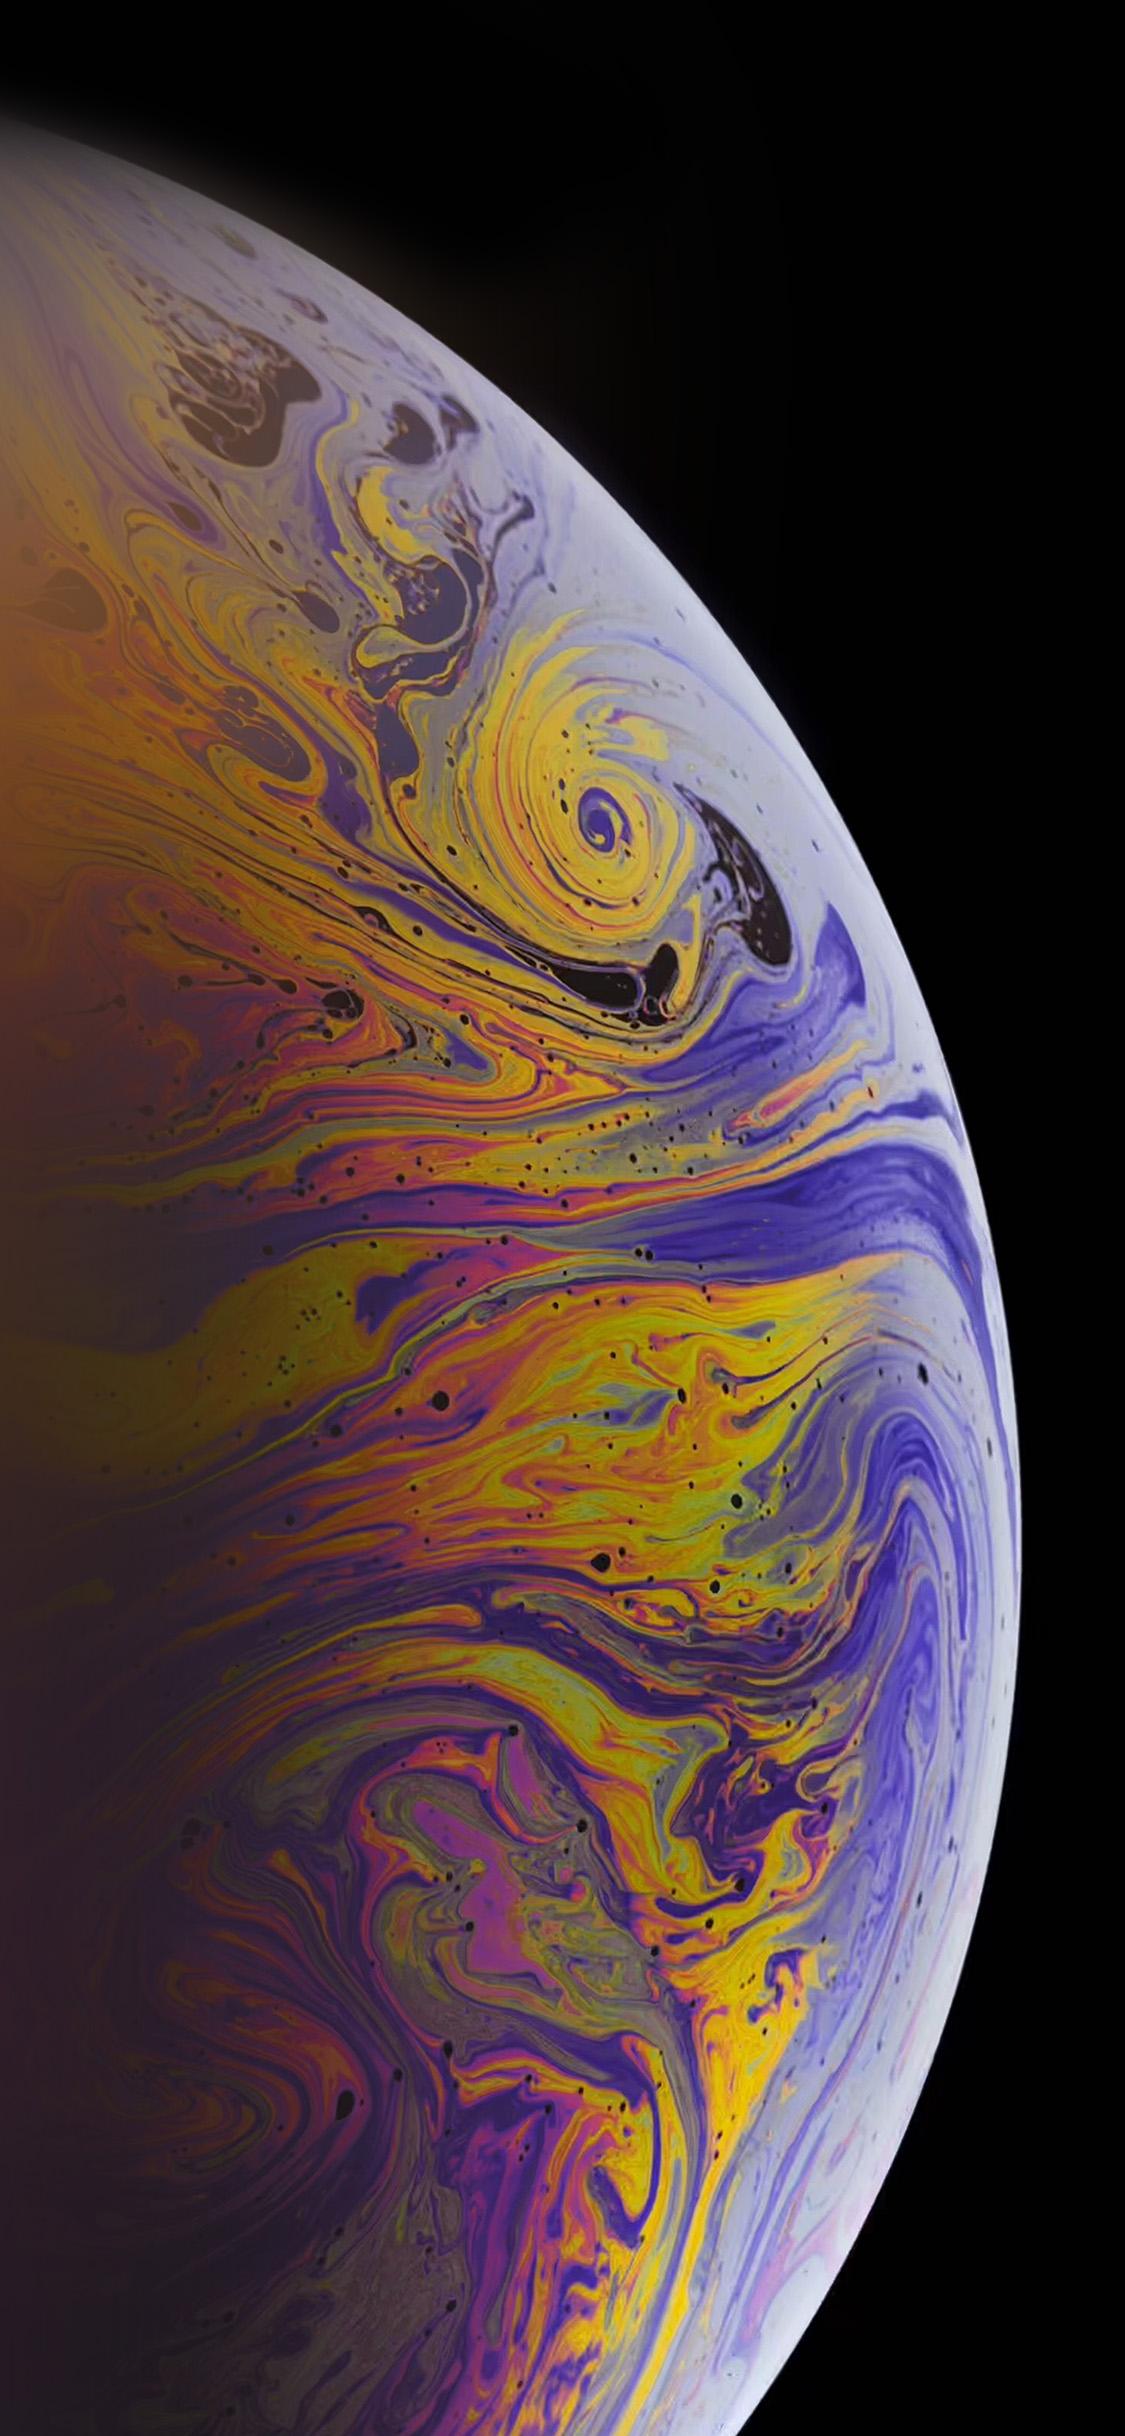 iPhonexpapers.com-Apple-iPhone-wallpaper-bg46-apple-bubble-rainbow-iphone-xs-max-art-dark